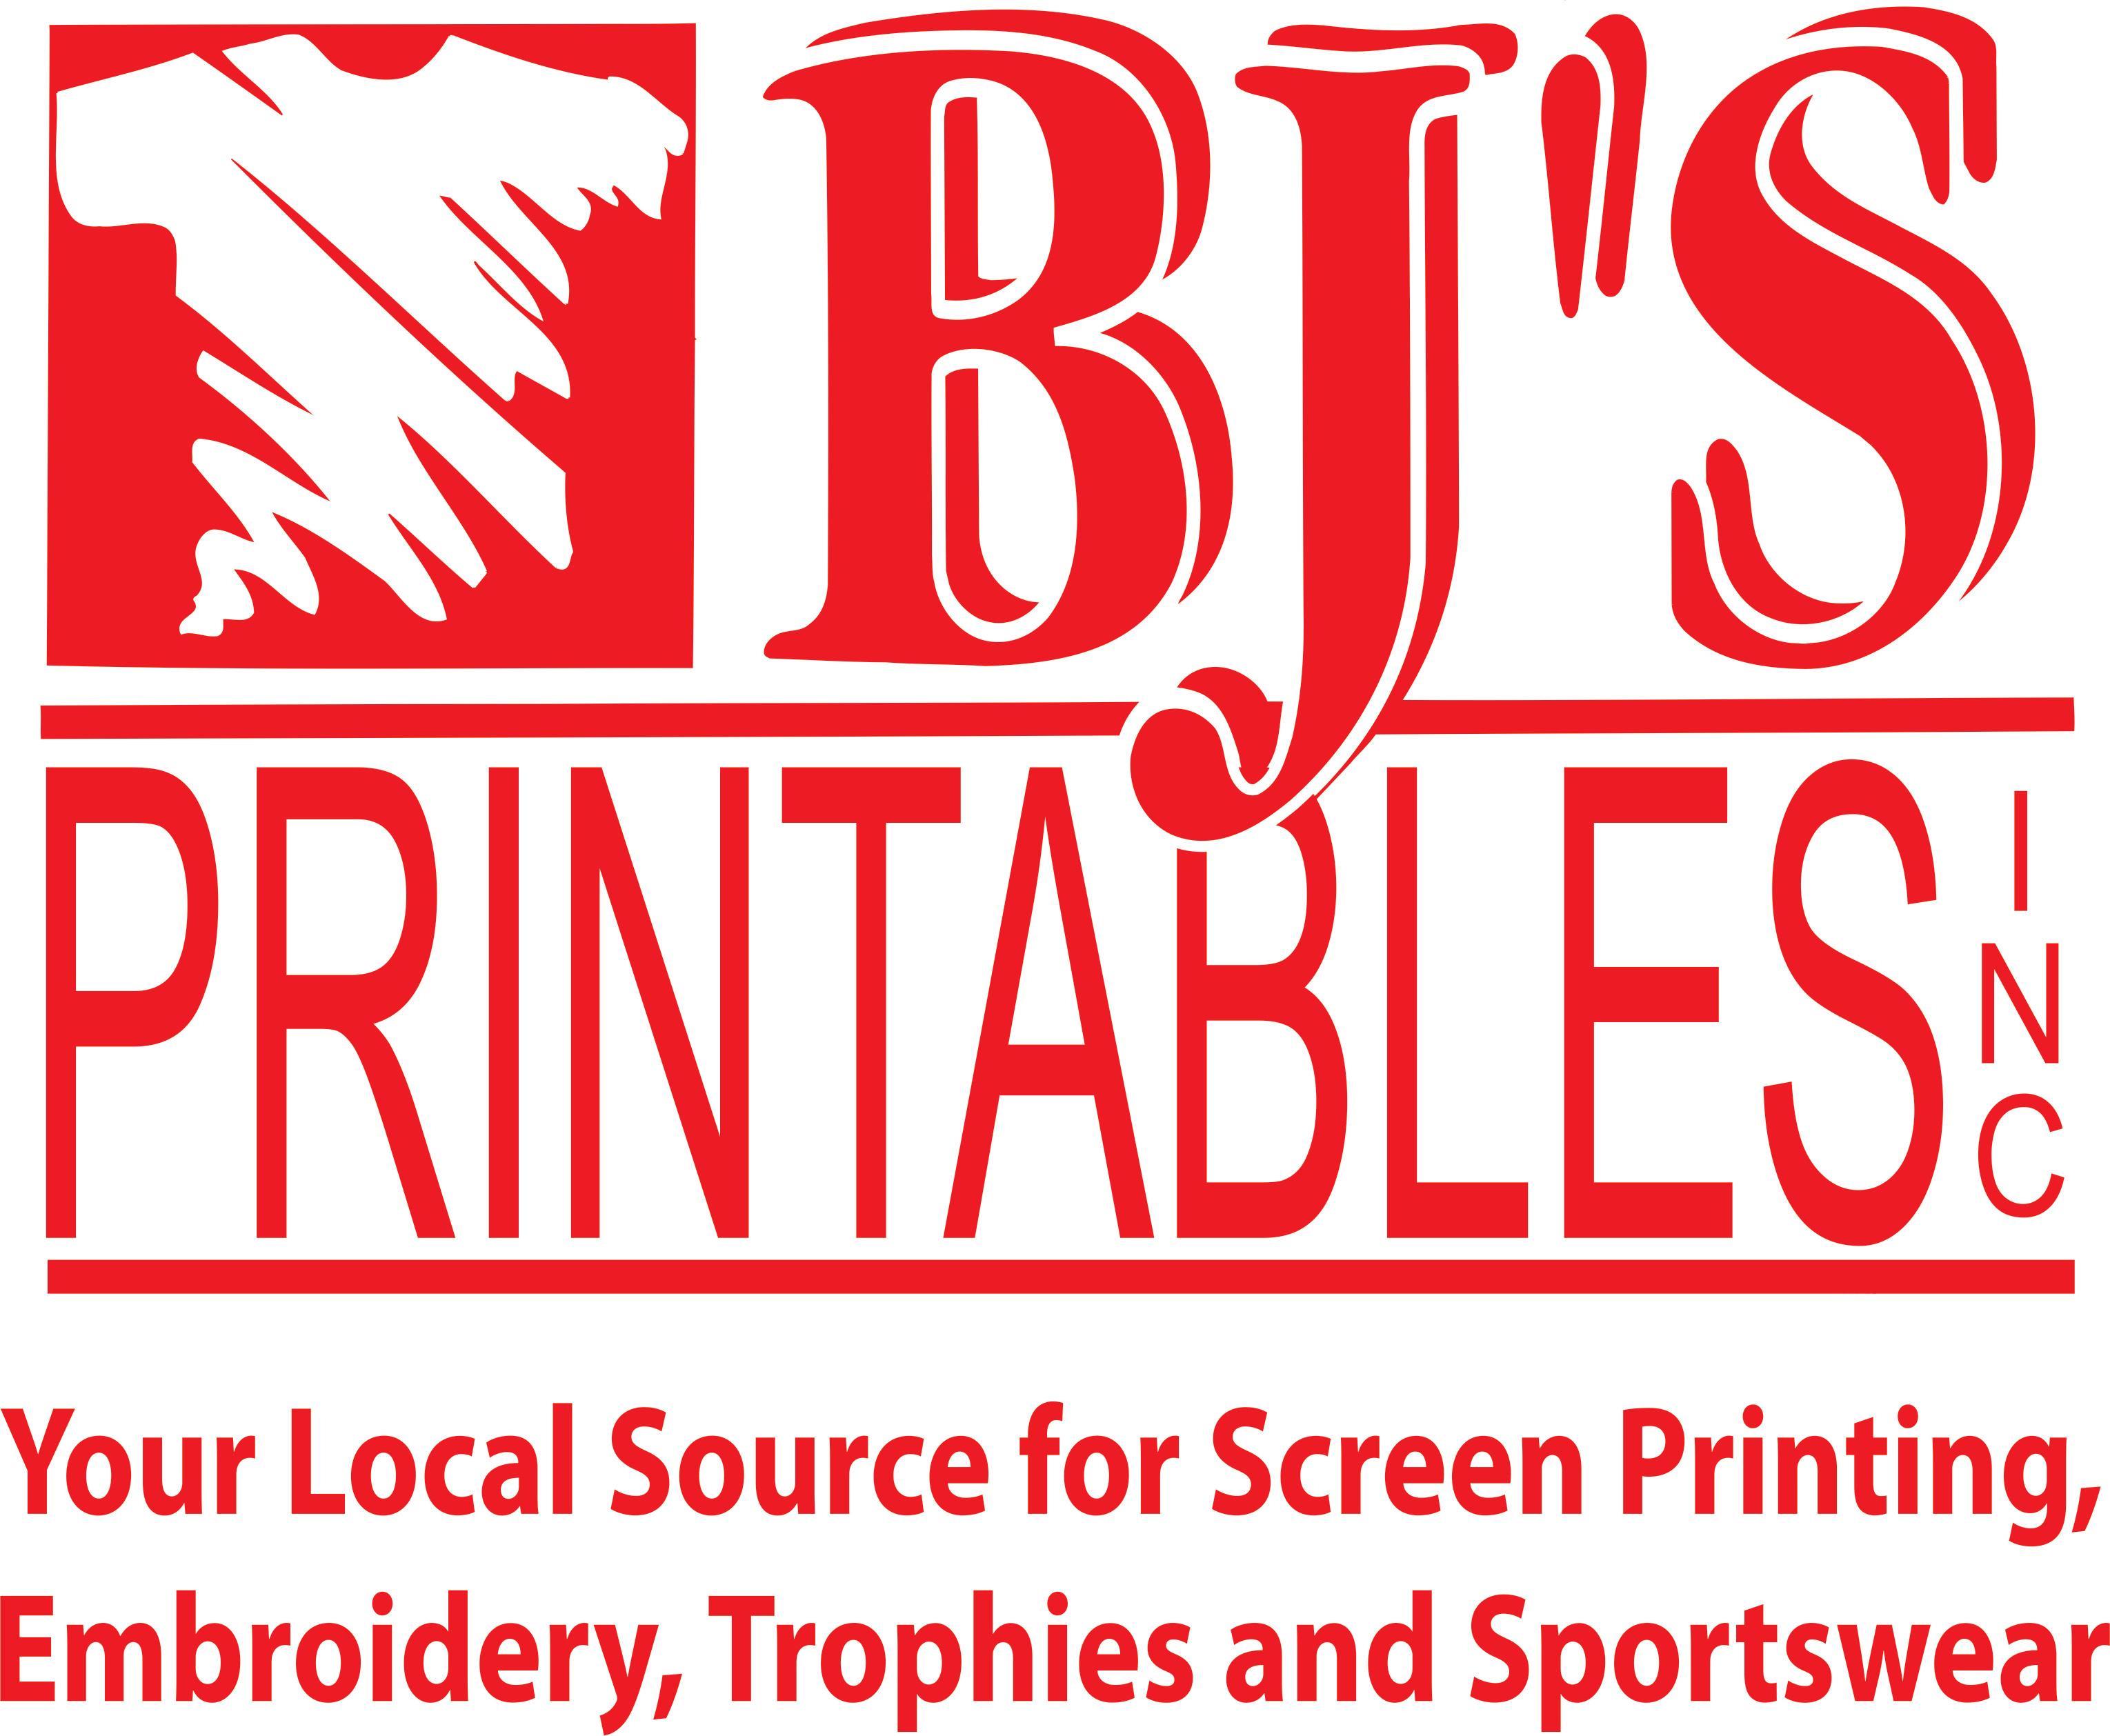 BJ's Printables Inc & Slogan